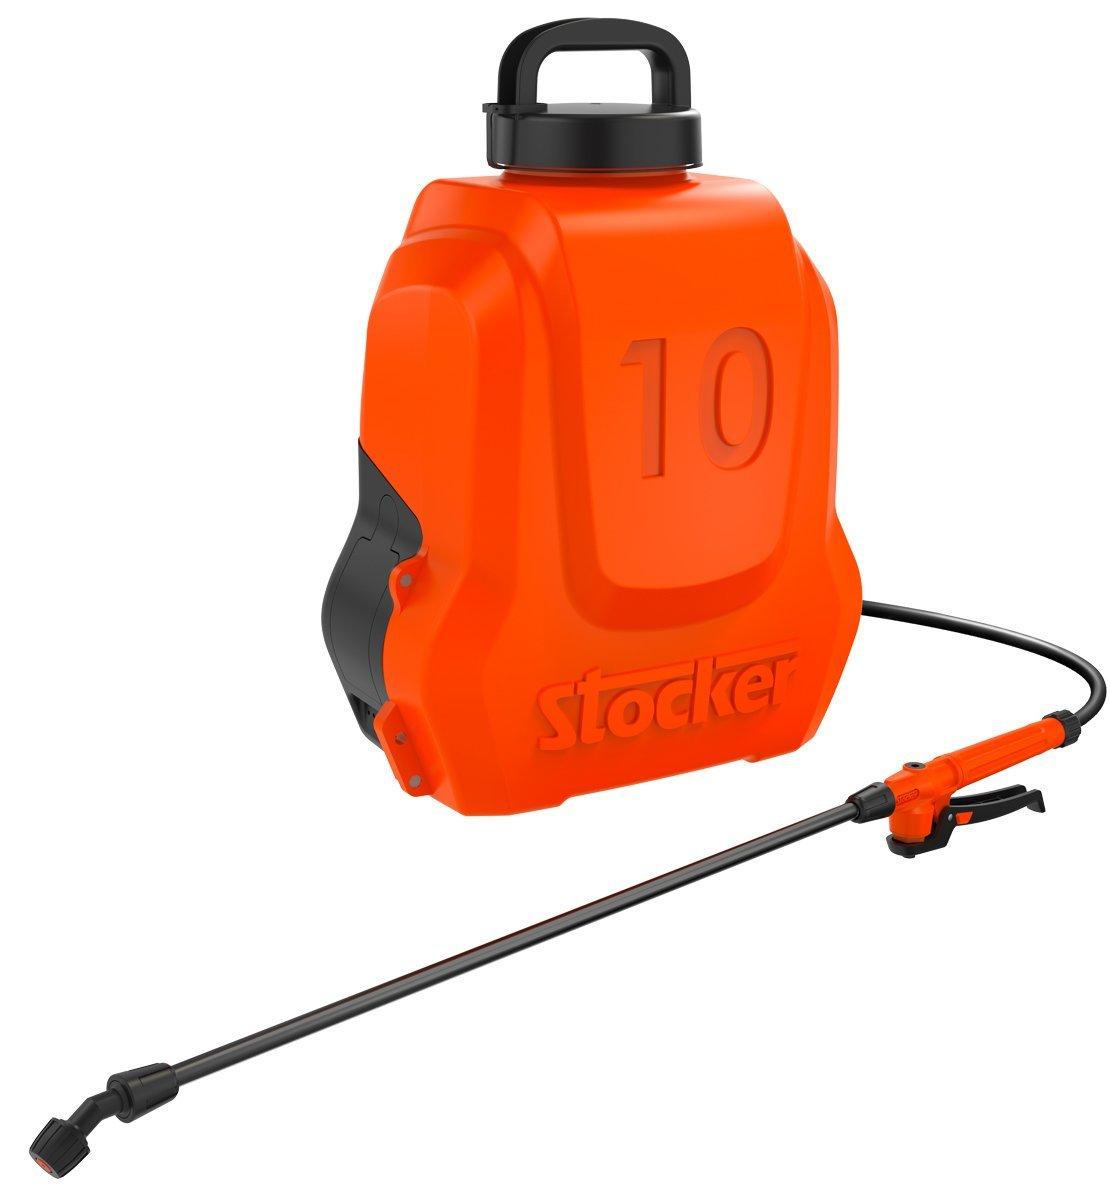 Stocker Pompa a zaino elettrica 10l Li-Ion